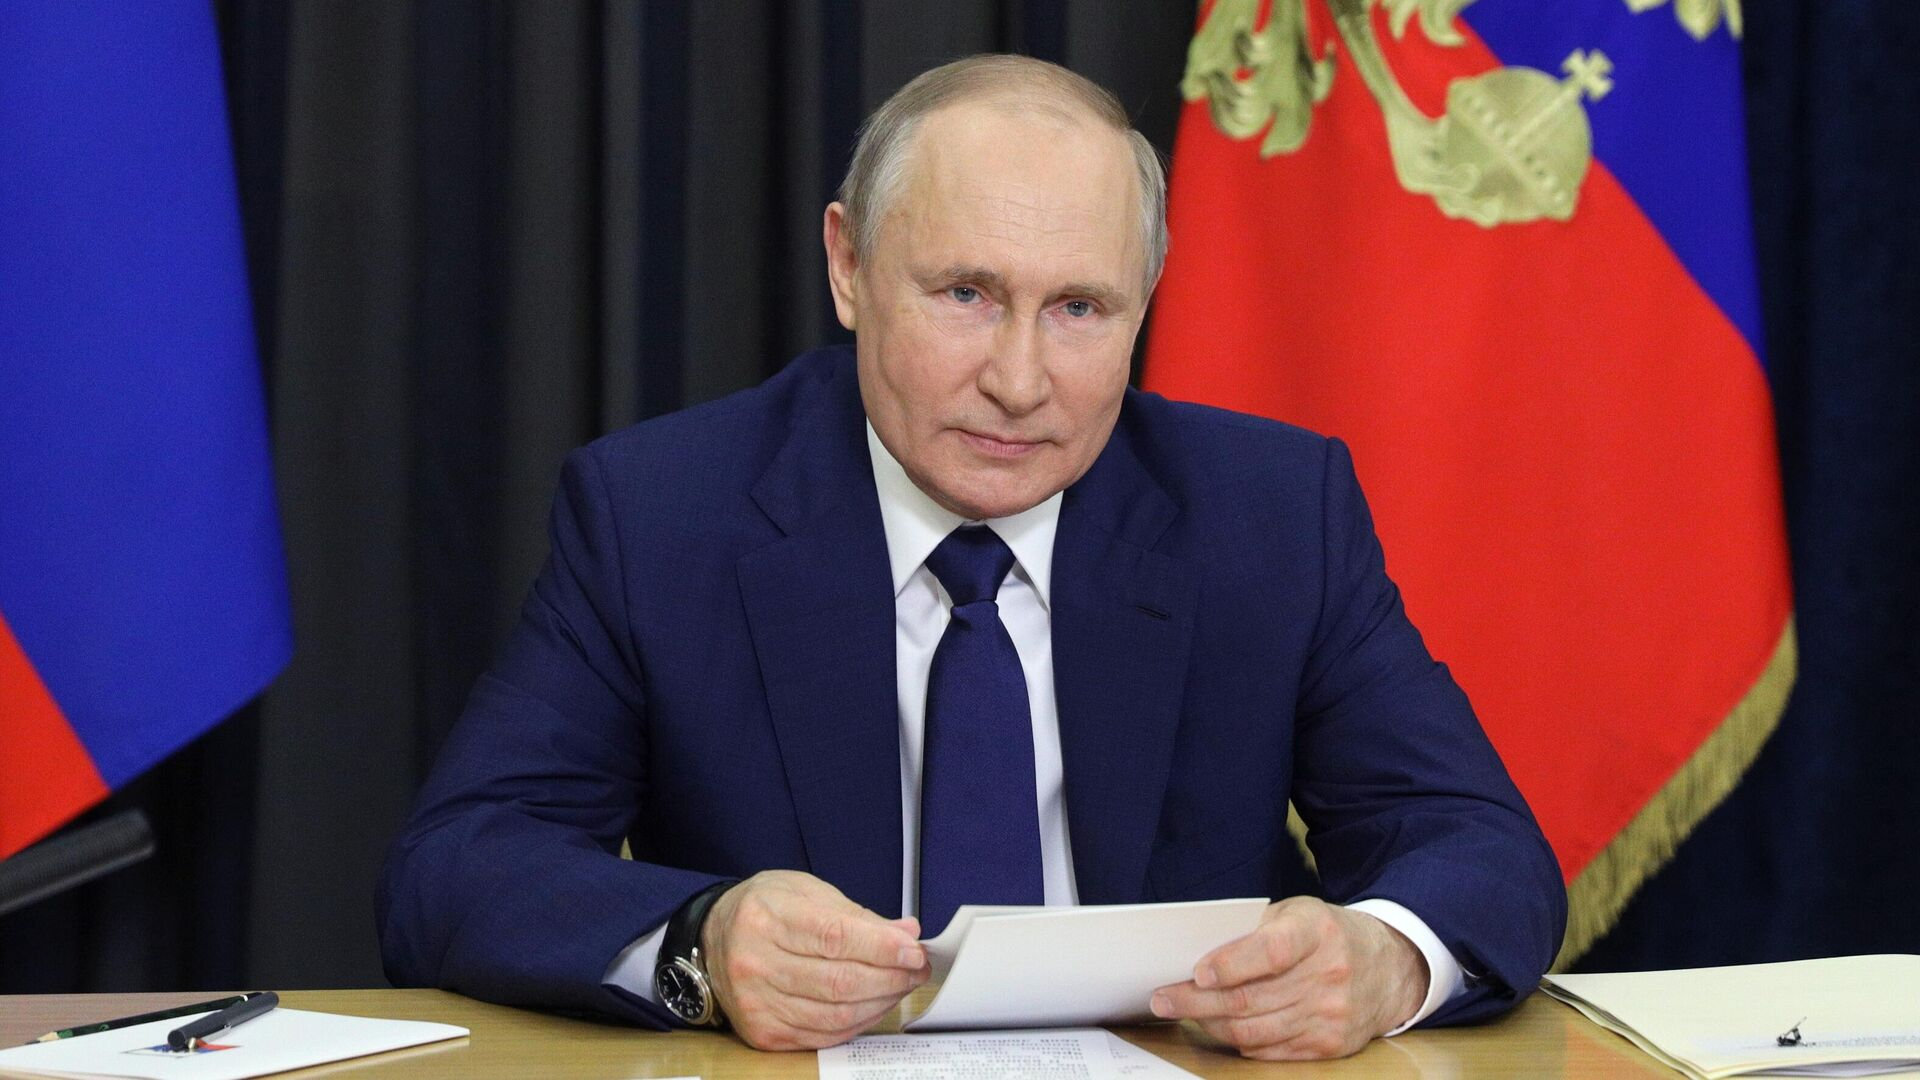 Президент РФ Владимир Путин - РИА Новости, 1920, 13.06.2021